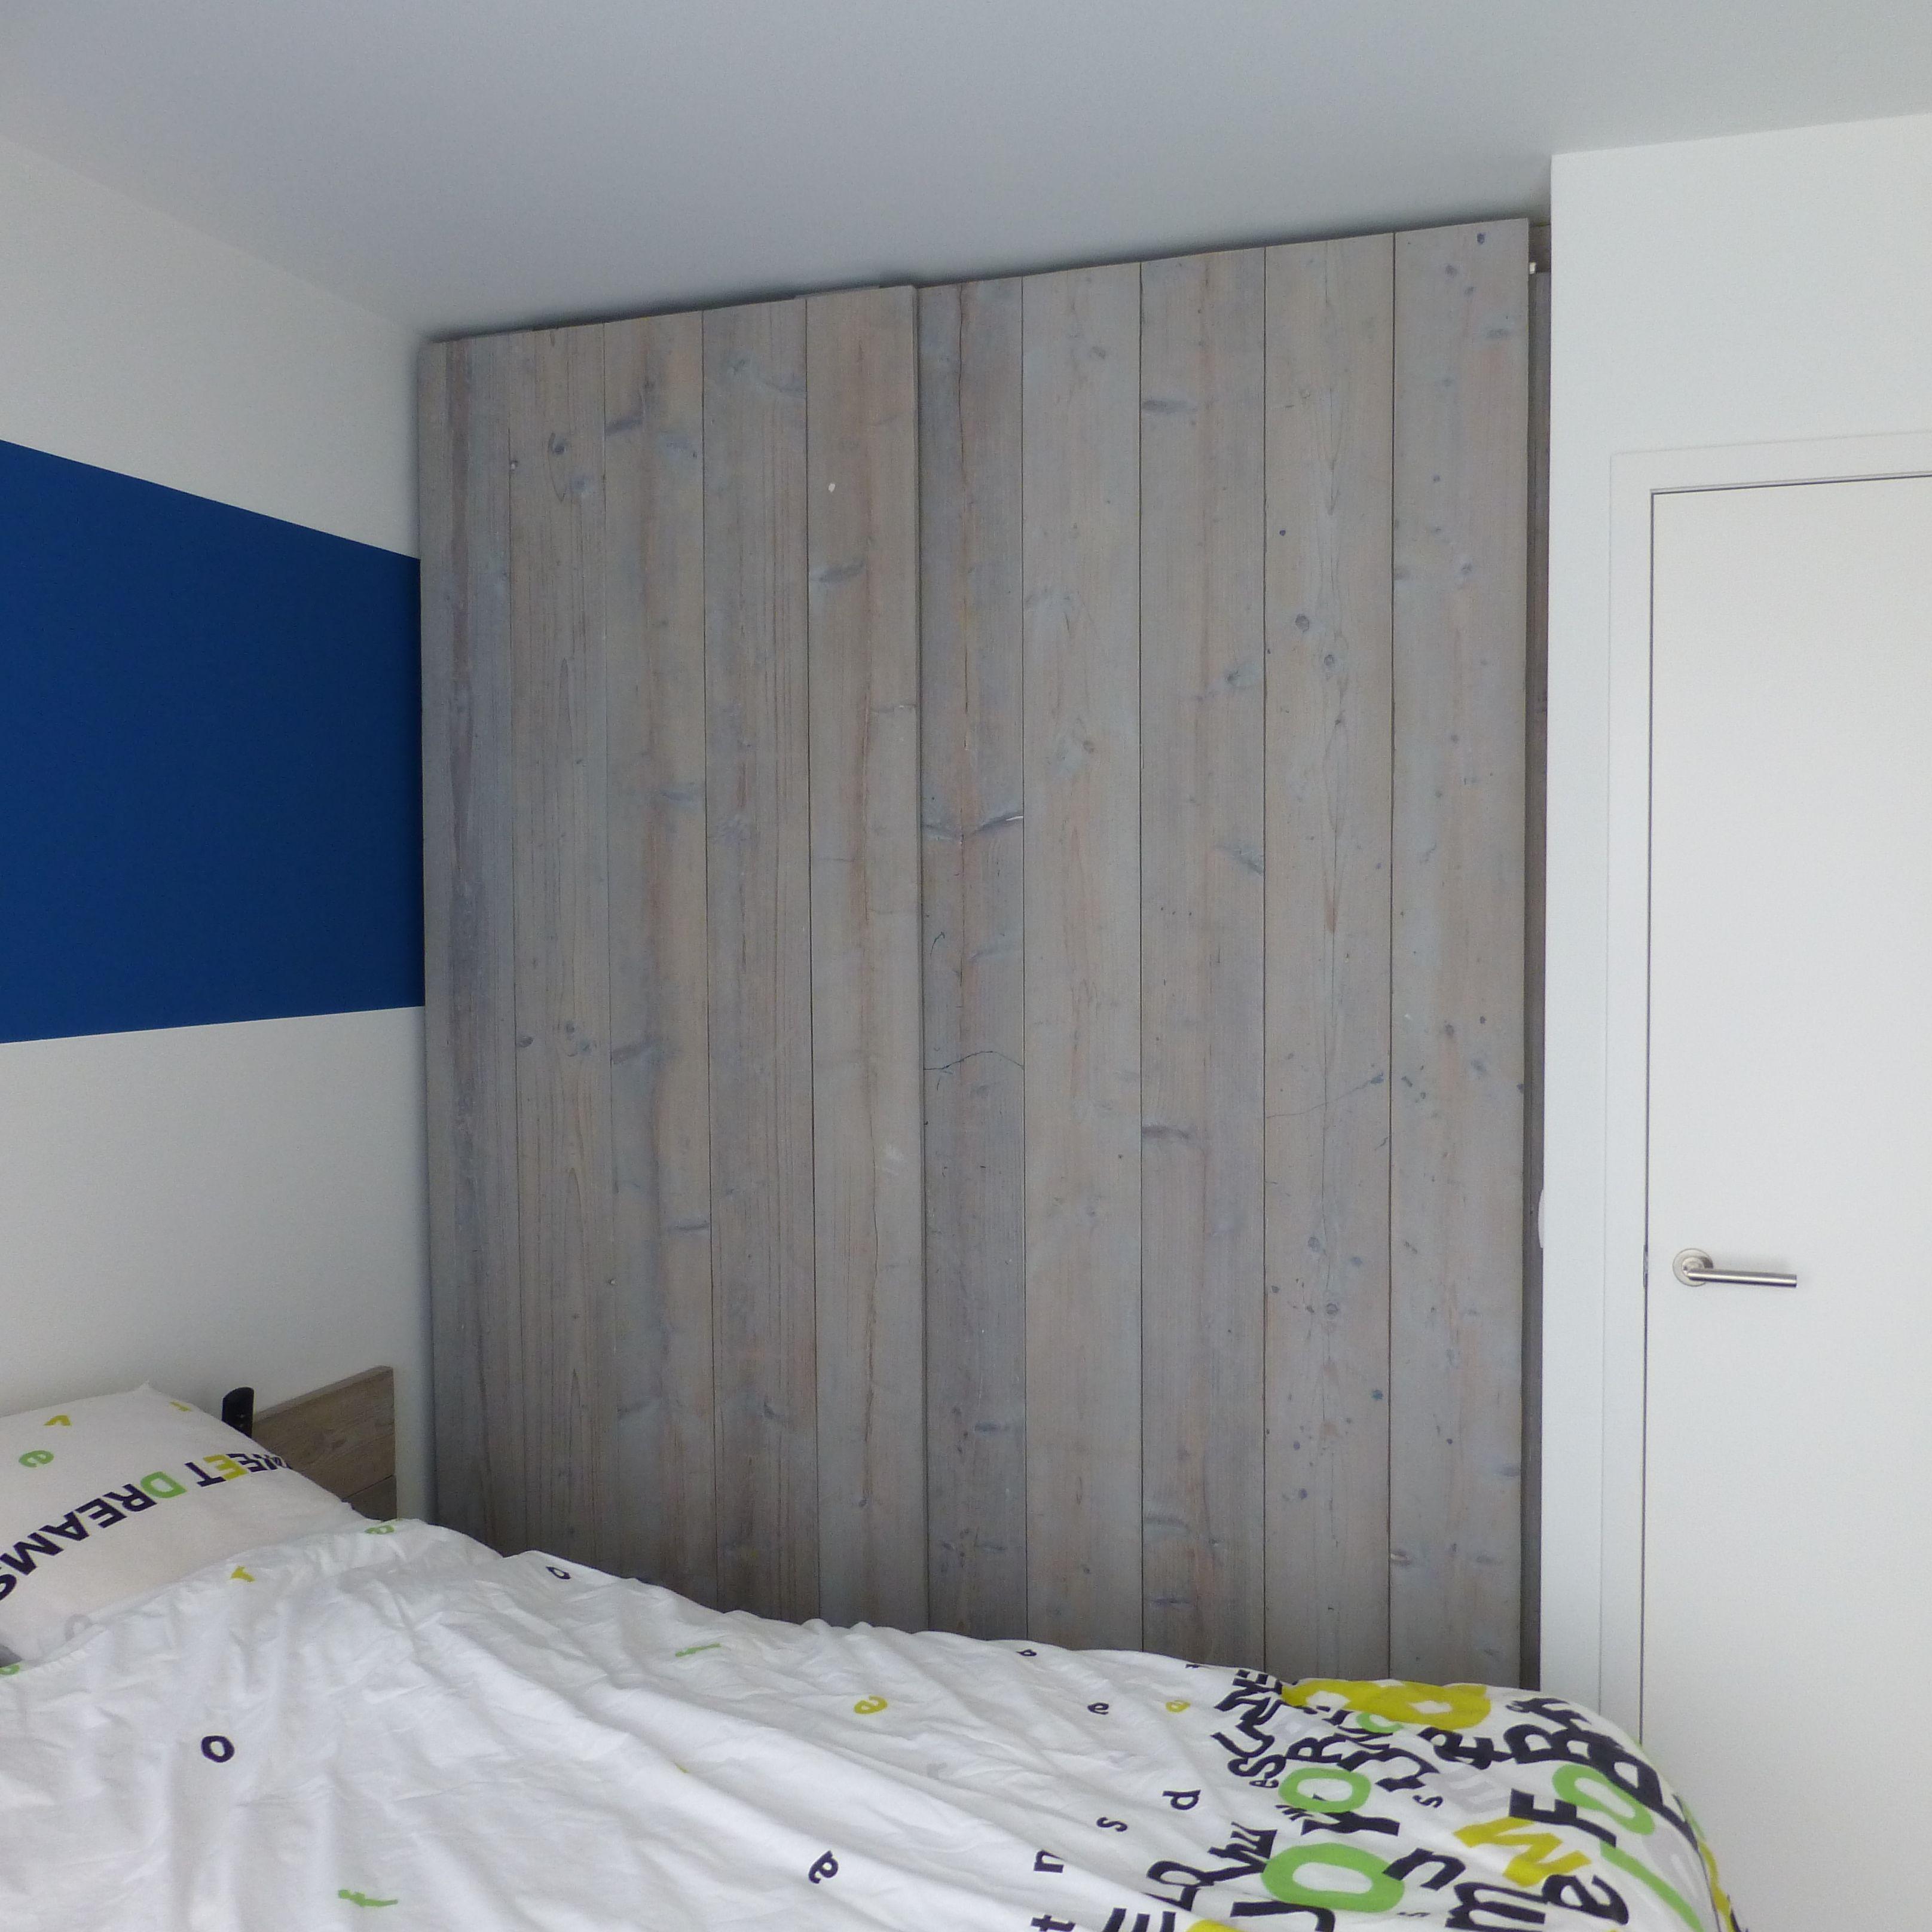 Appartement Oostende: Slaapkamerkast en bed in steigerhout ...